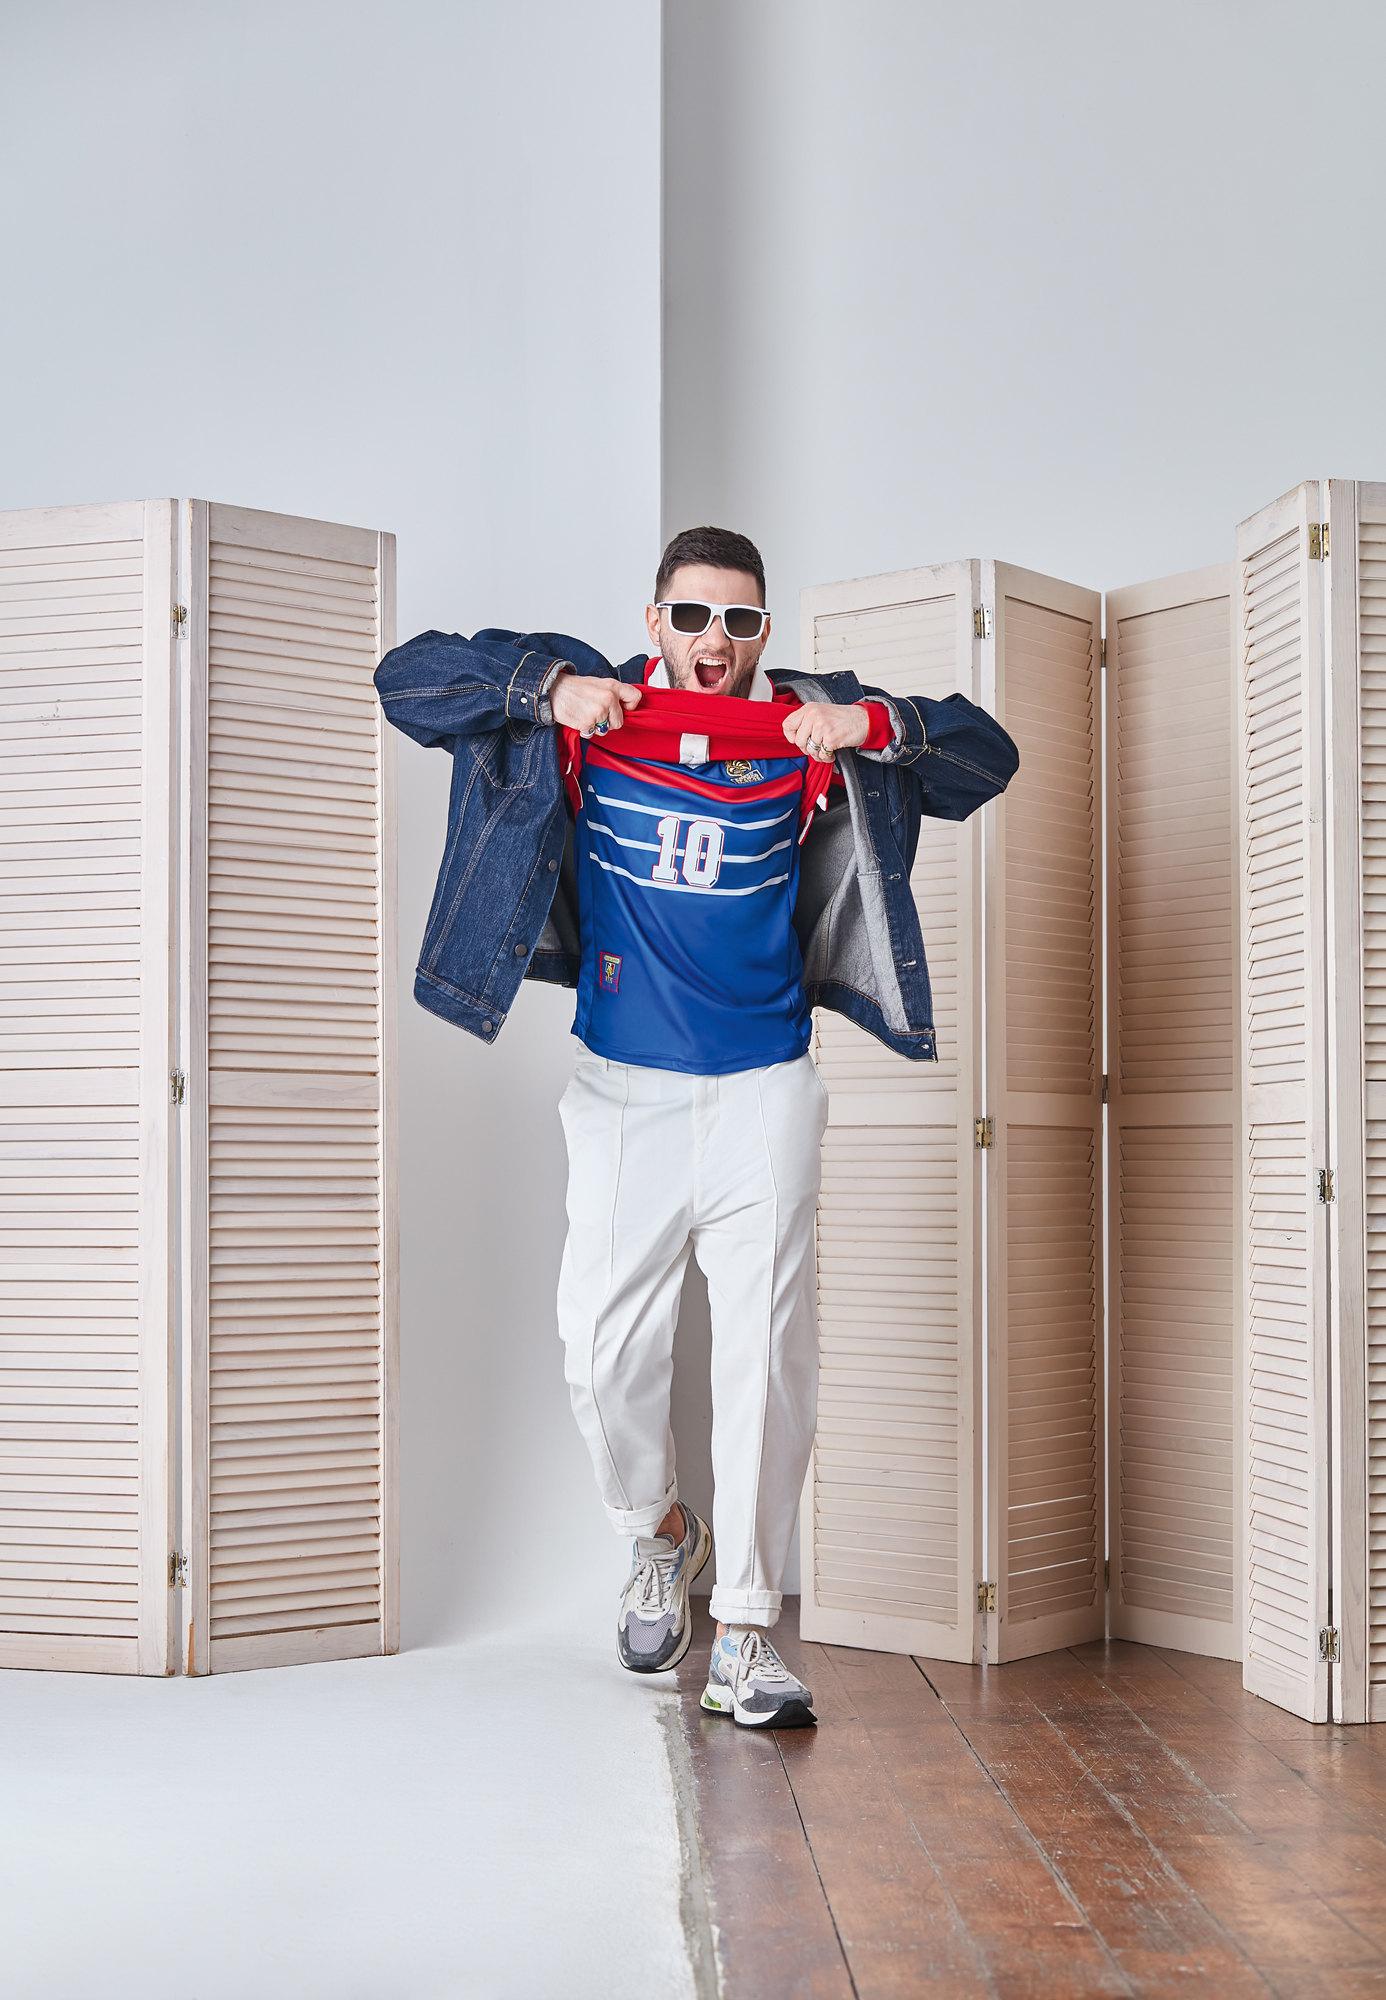 Очки Armani Exchange Джинсовая куртка Levi'sПоло GucciДжерси, собственность АлександраБрюки Brunello CucinelliКроссовки Premiata